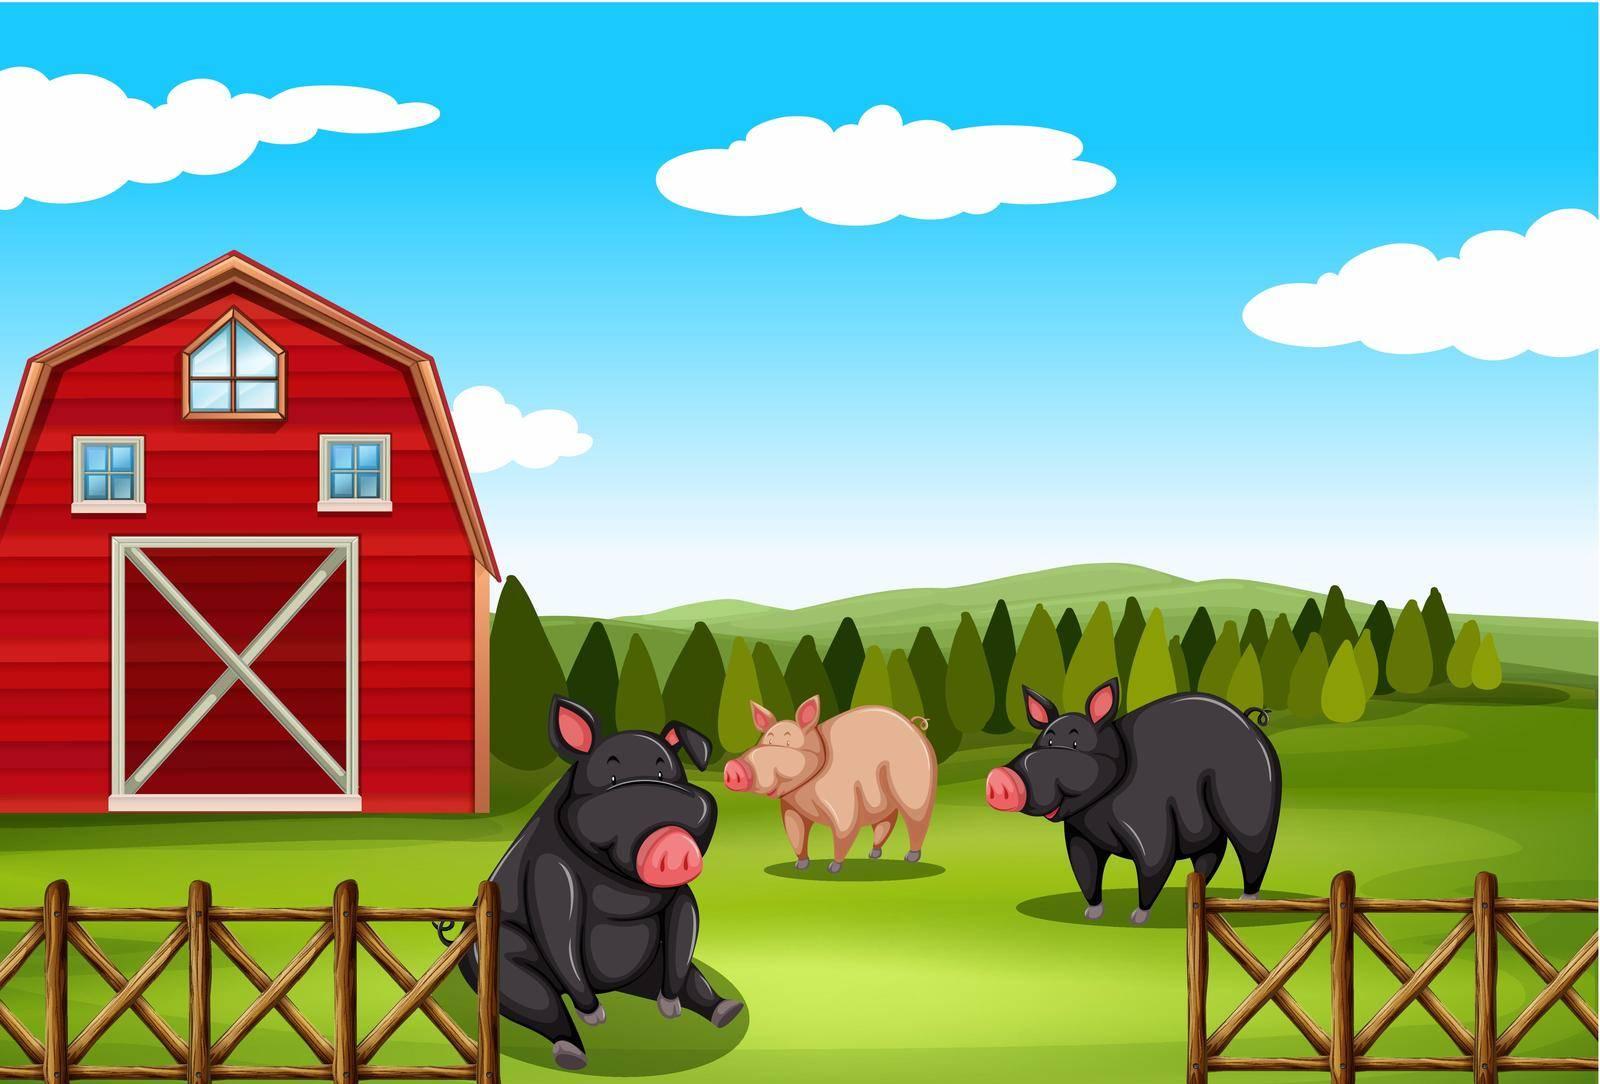 Pigs sitting in a farm field